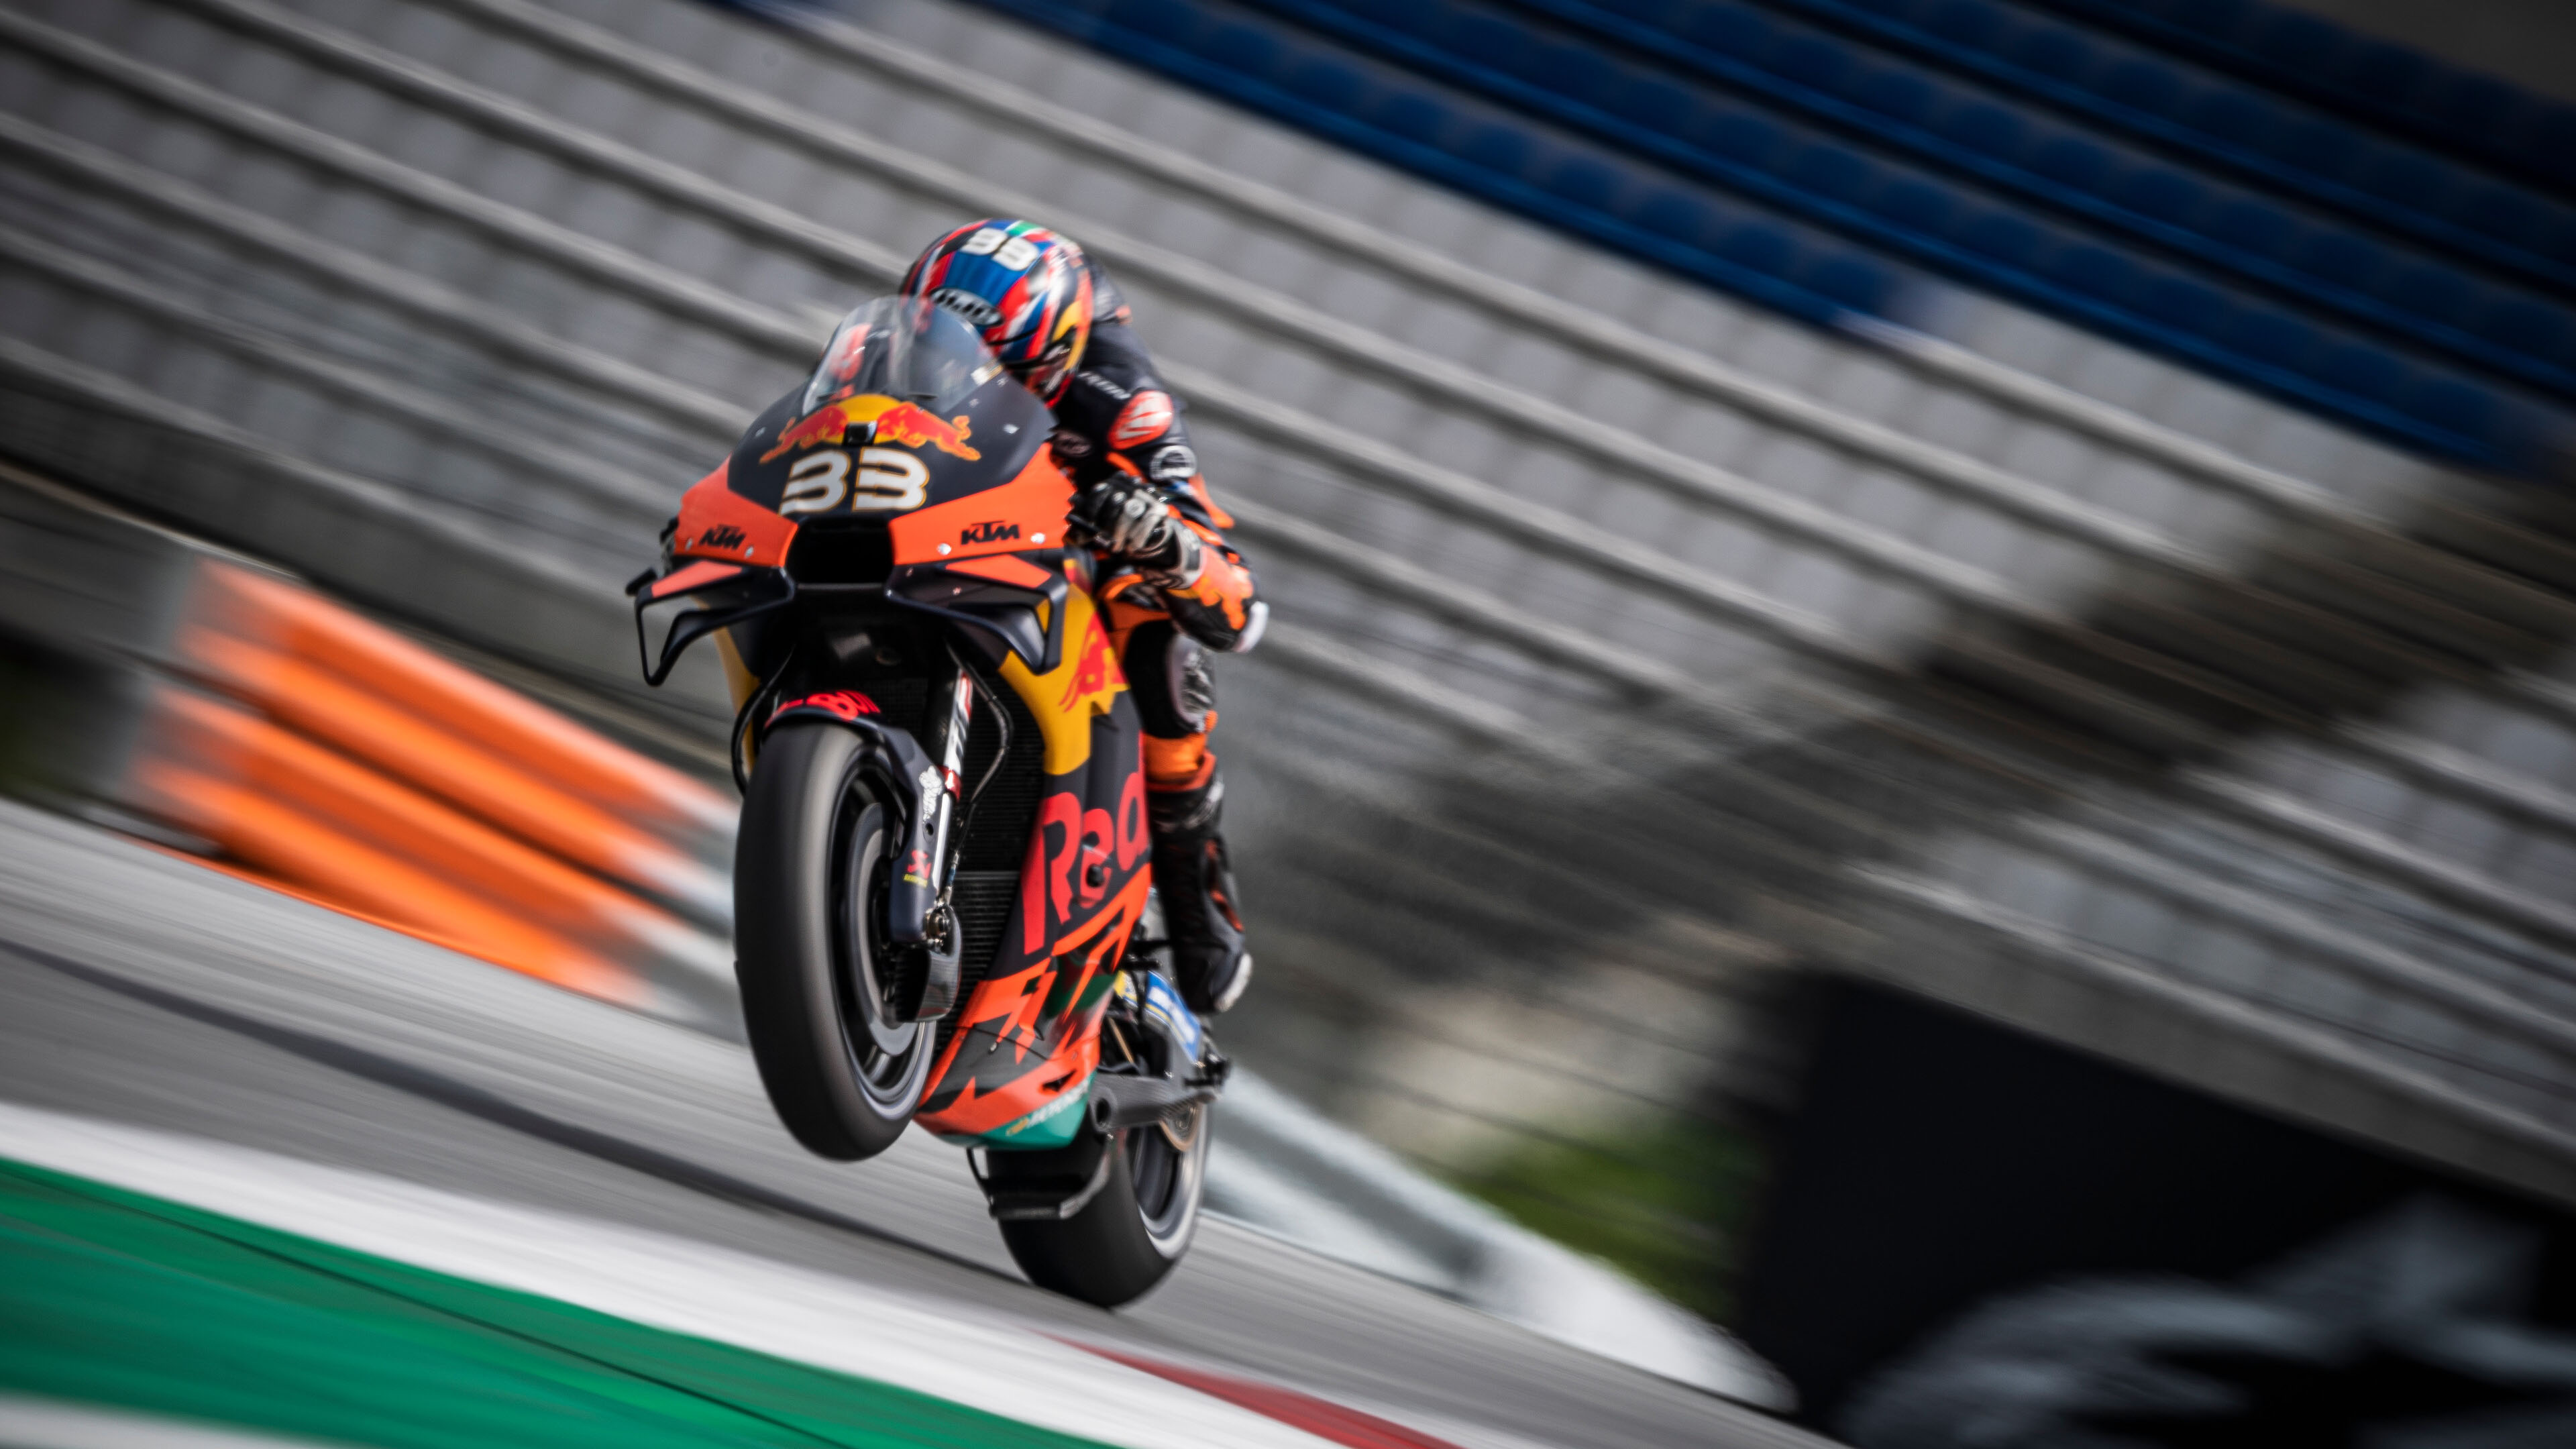 Red Bull 全新紀錄片登場:MotoGP 的崛起新星 Brad Binder